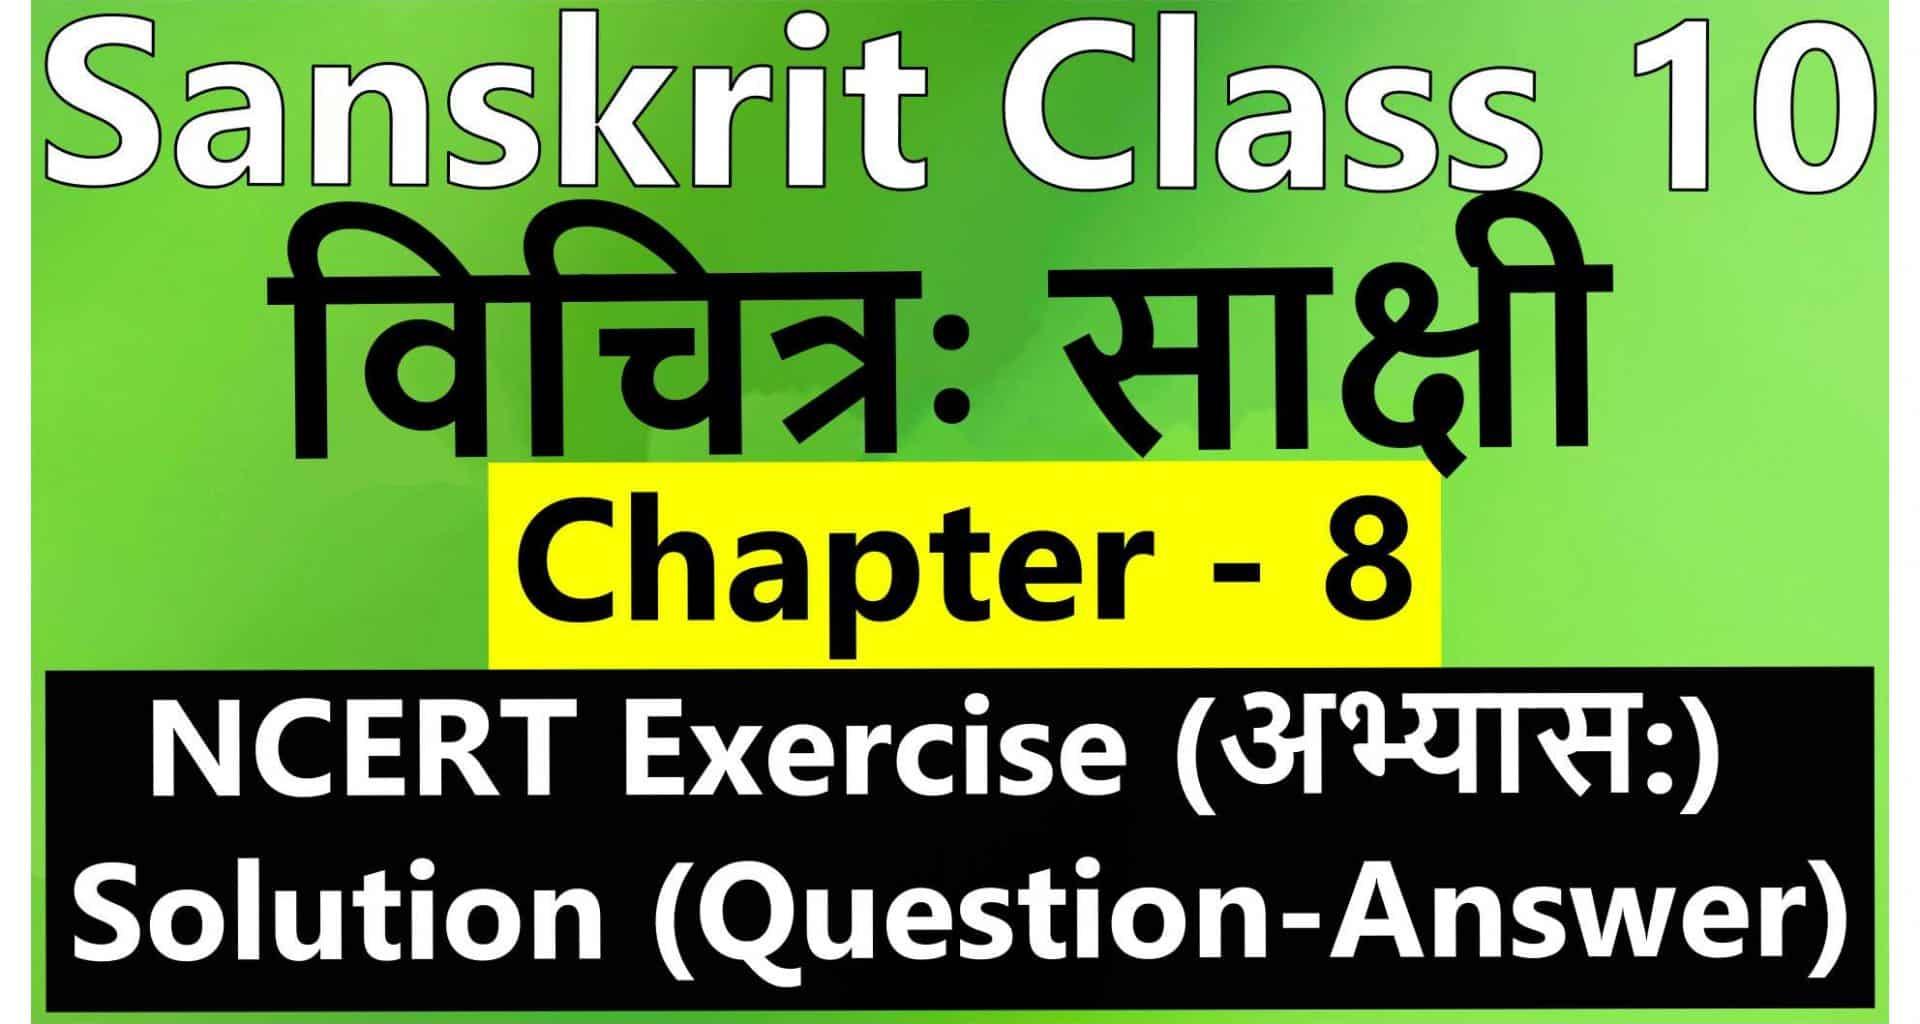 Sanskrit Class 10 - Chapter 8 - विचित्रः साक्षी - NCERT Exercise Solution (Question-Answer)